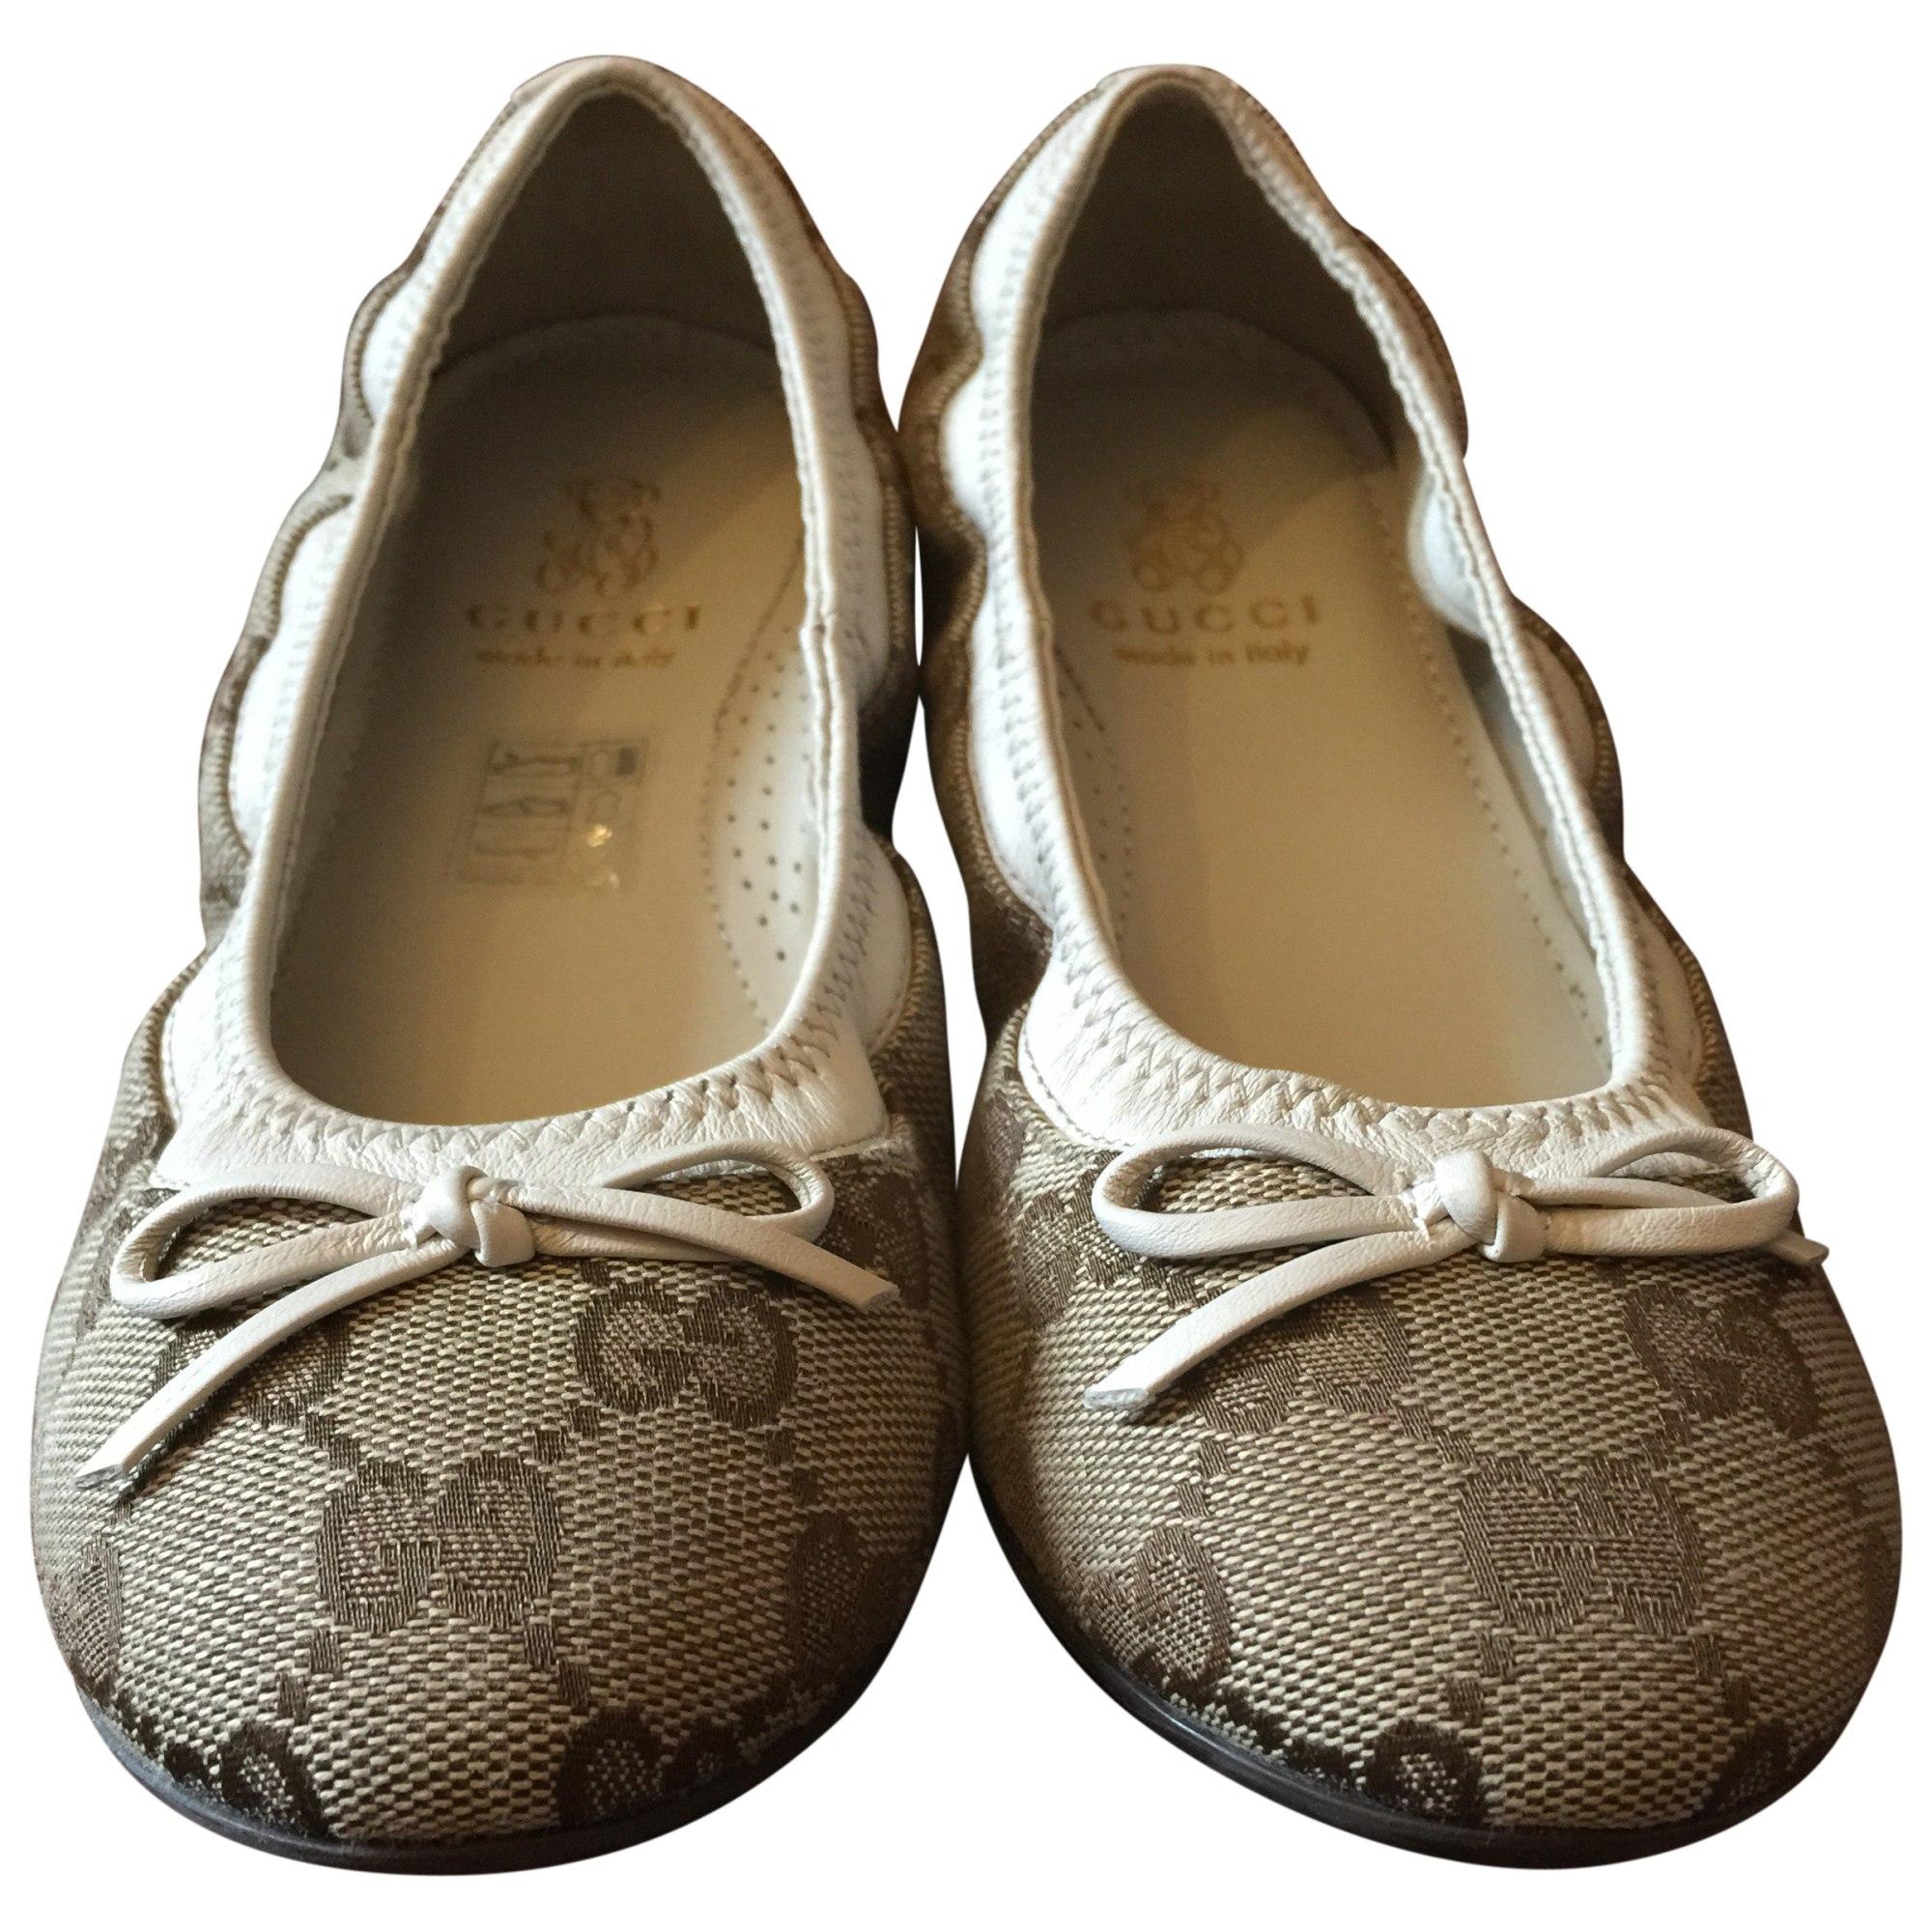 97853a450 Ballet Flats GUCCI 32 beige vendu par Nal - 3534766